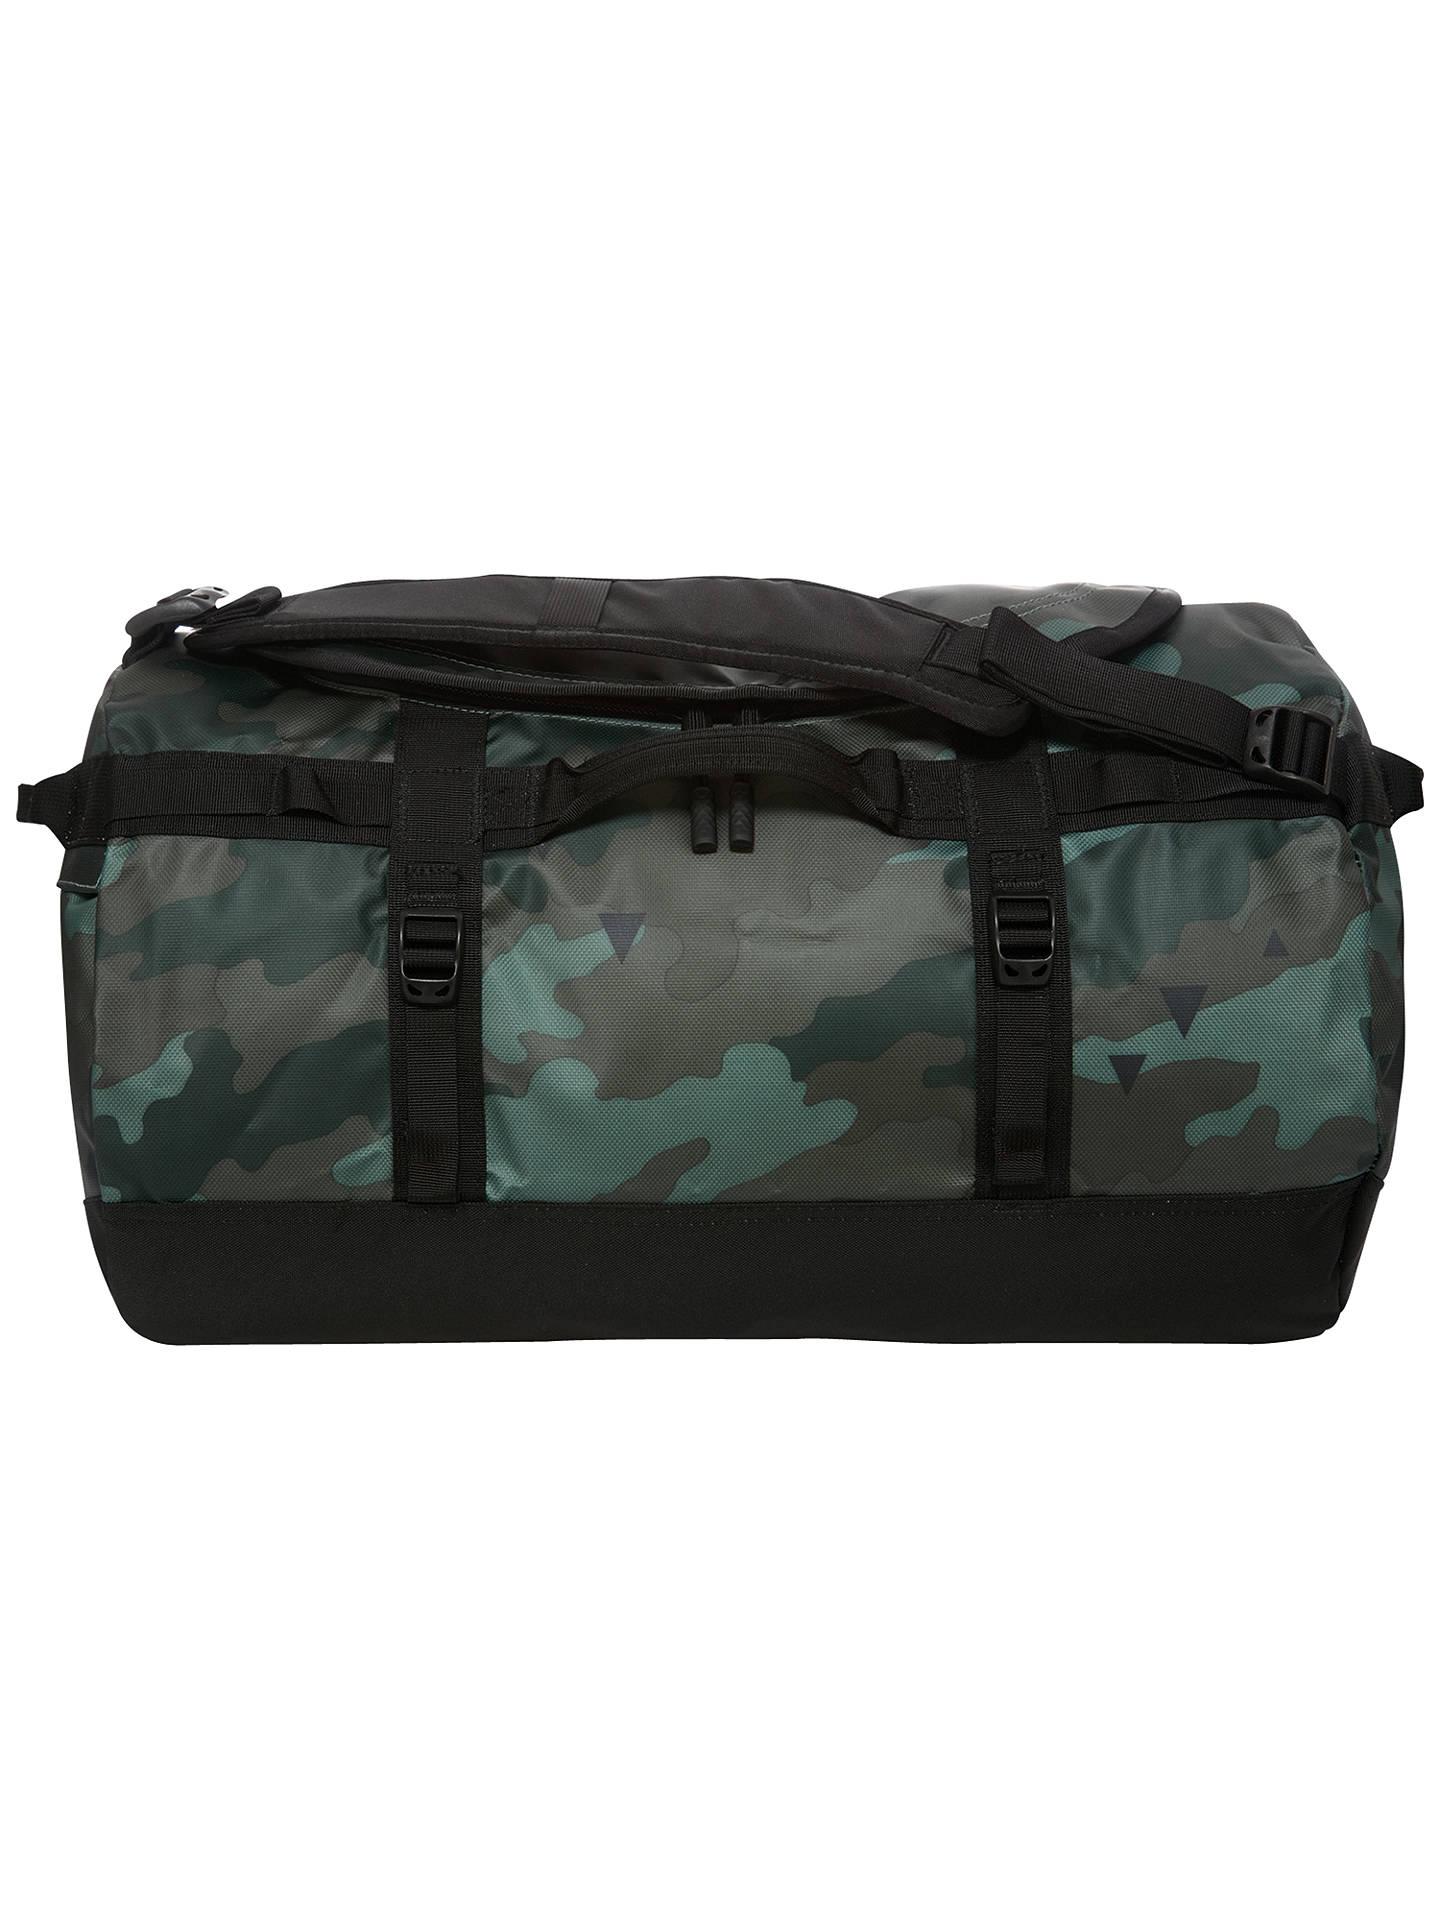 700a2c792e3 Buy The North Face Base Camp Duffle Bag